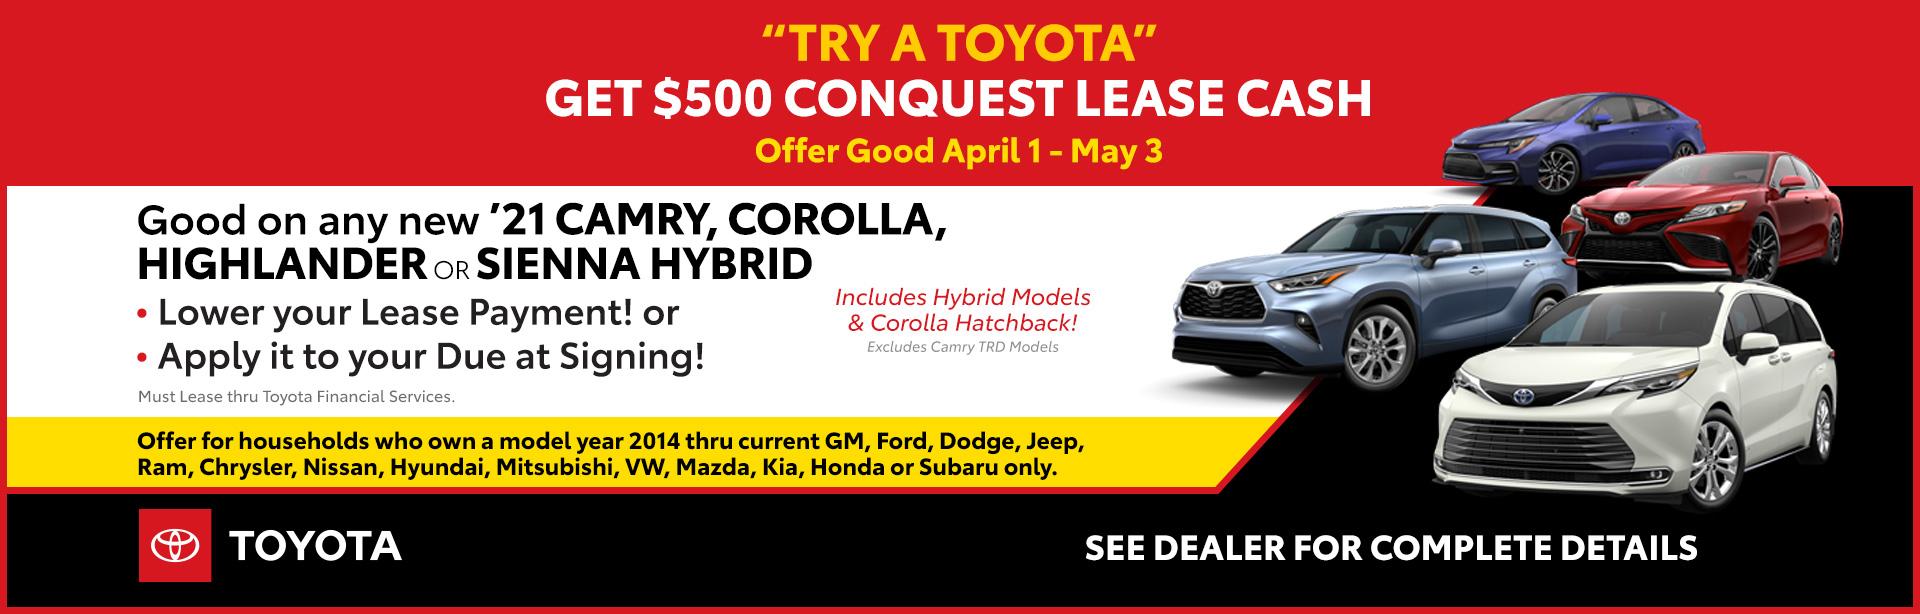 04-21_01_Cincinnati-April-2021-CIN-Conquest_1920x614_4e94_Camry-Corolla-Highlander-Sienna-Highlander-Hybrid-Corolla-Hatchback-Corolla-Hybrid-Camry-Hybrid_O_xta.jpeg